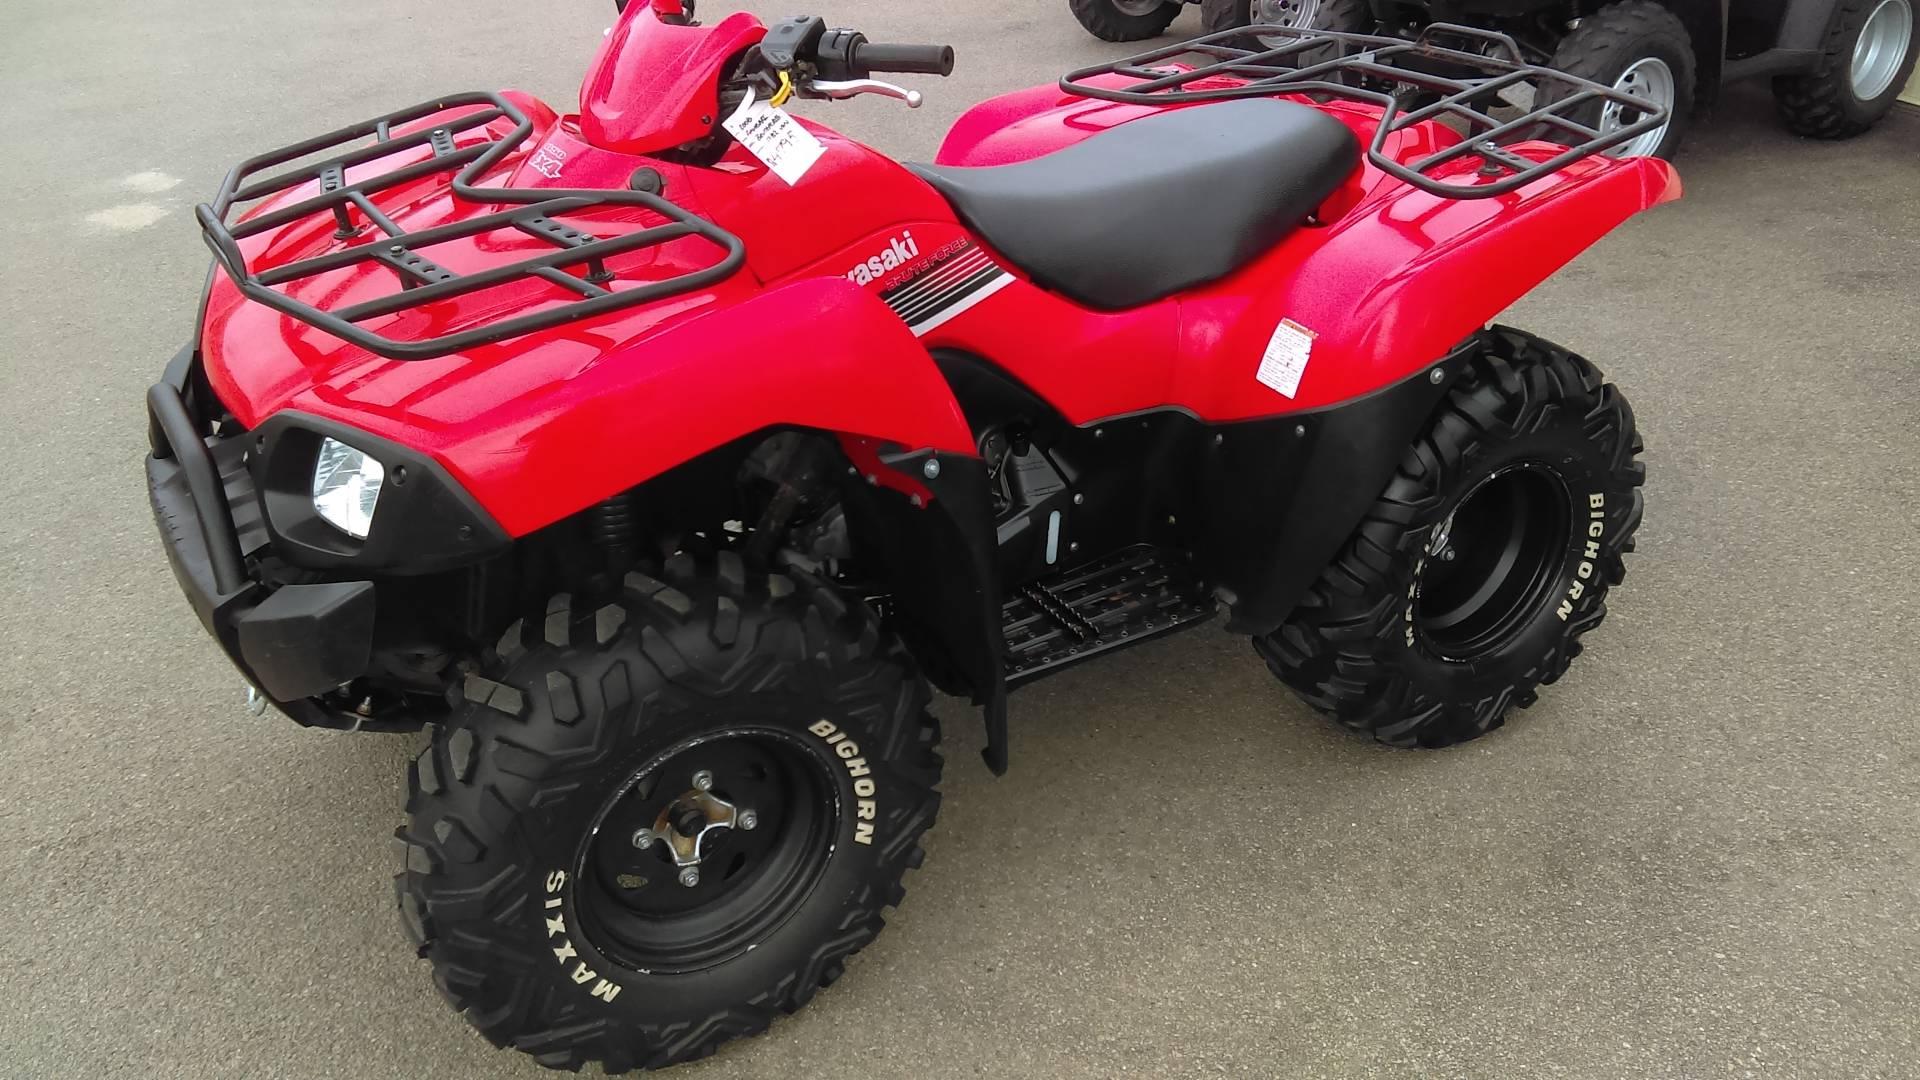 2008 Kawasaki Brute Force® 650 4x4 in Butte, Montana